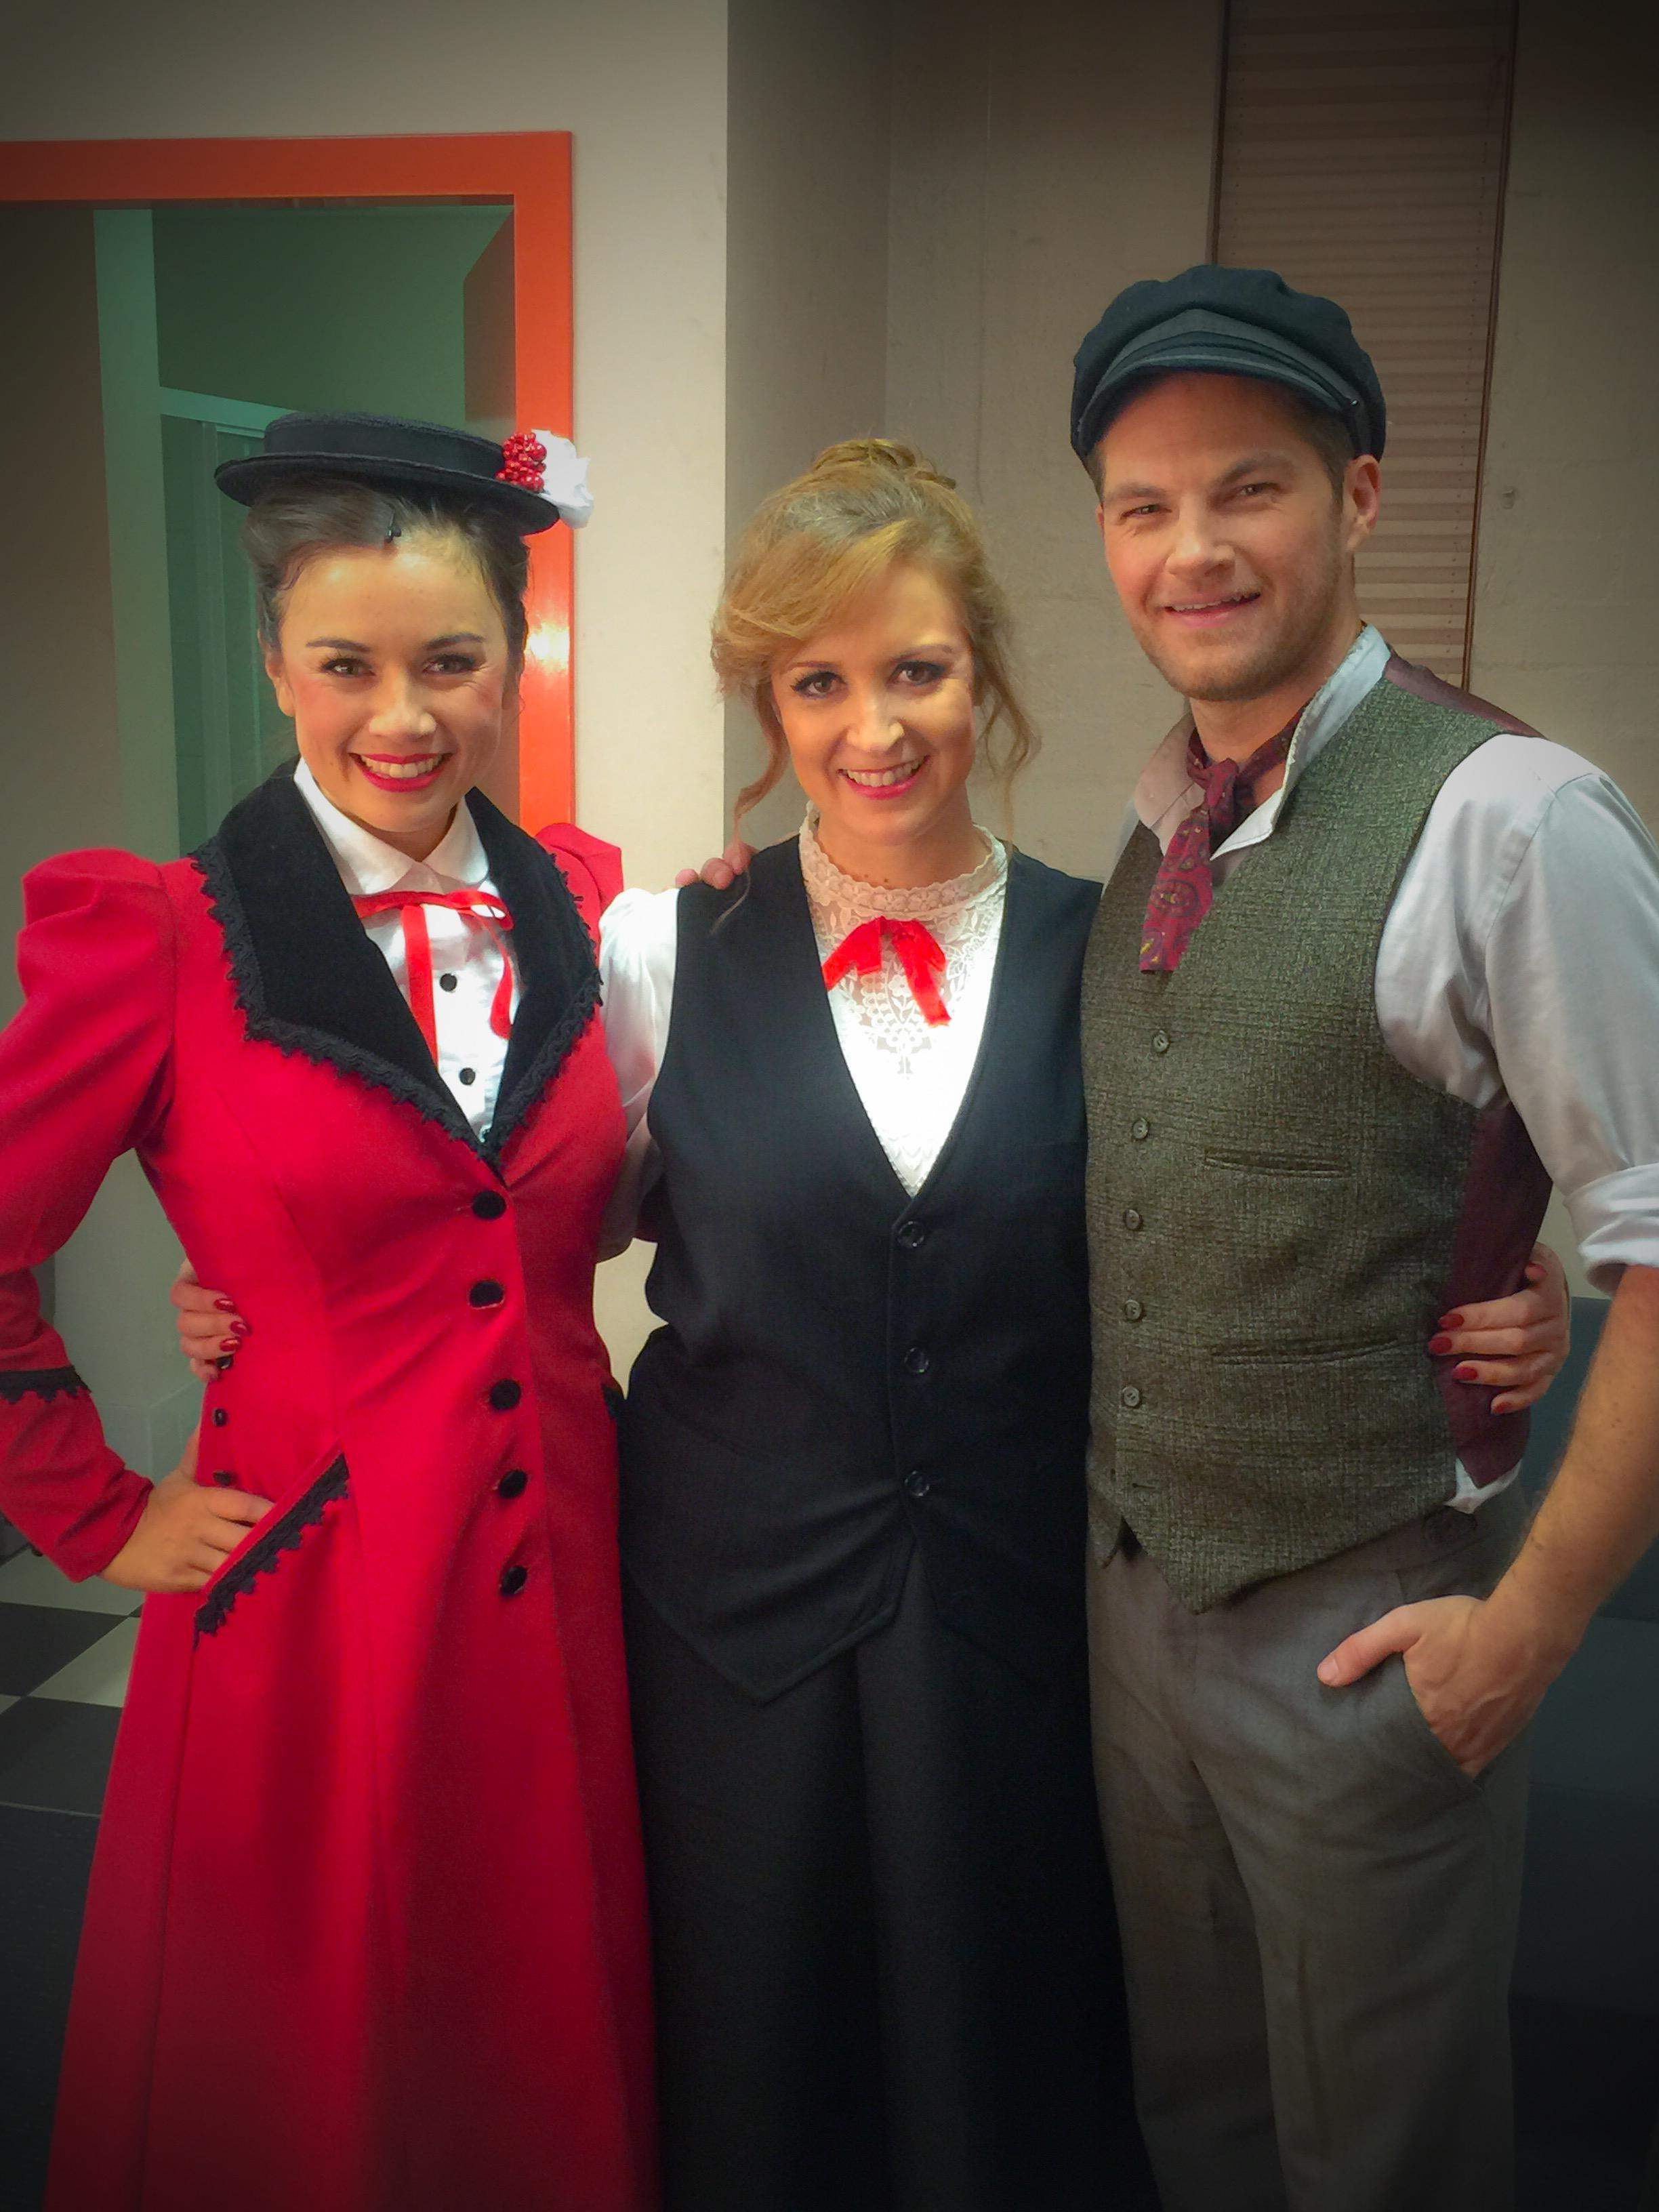 Janelle, Mary & Bert